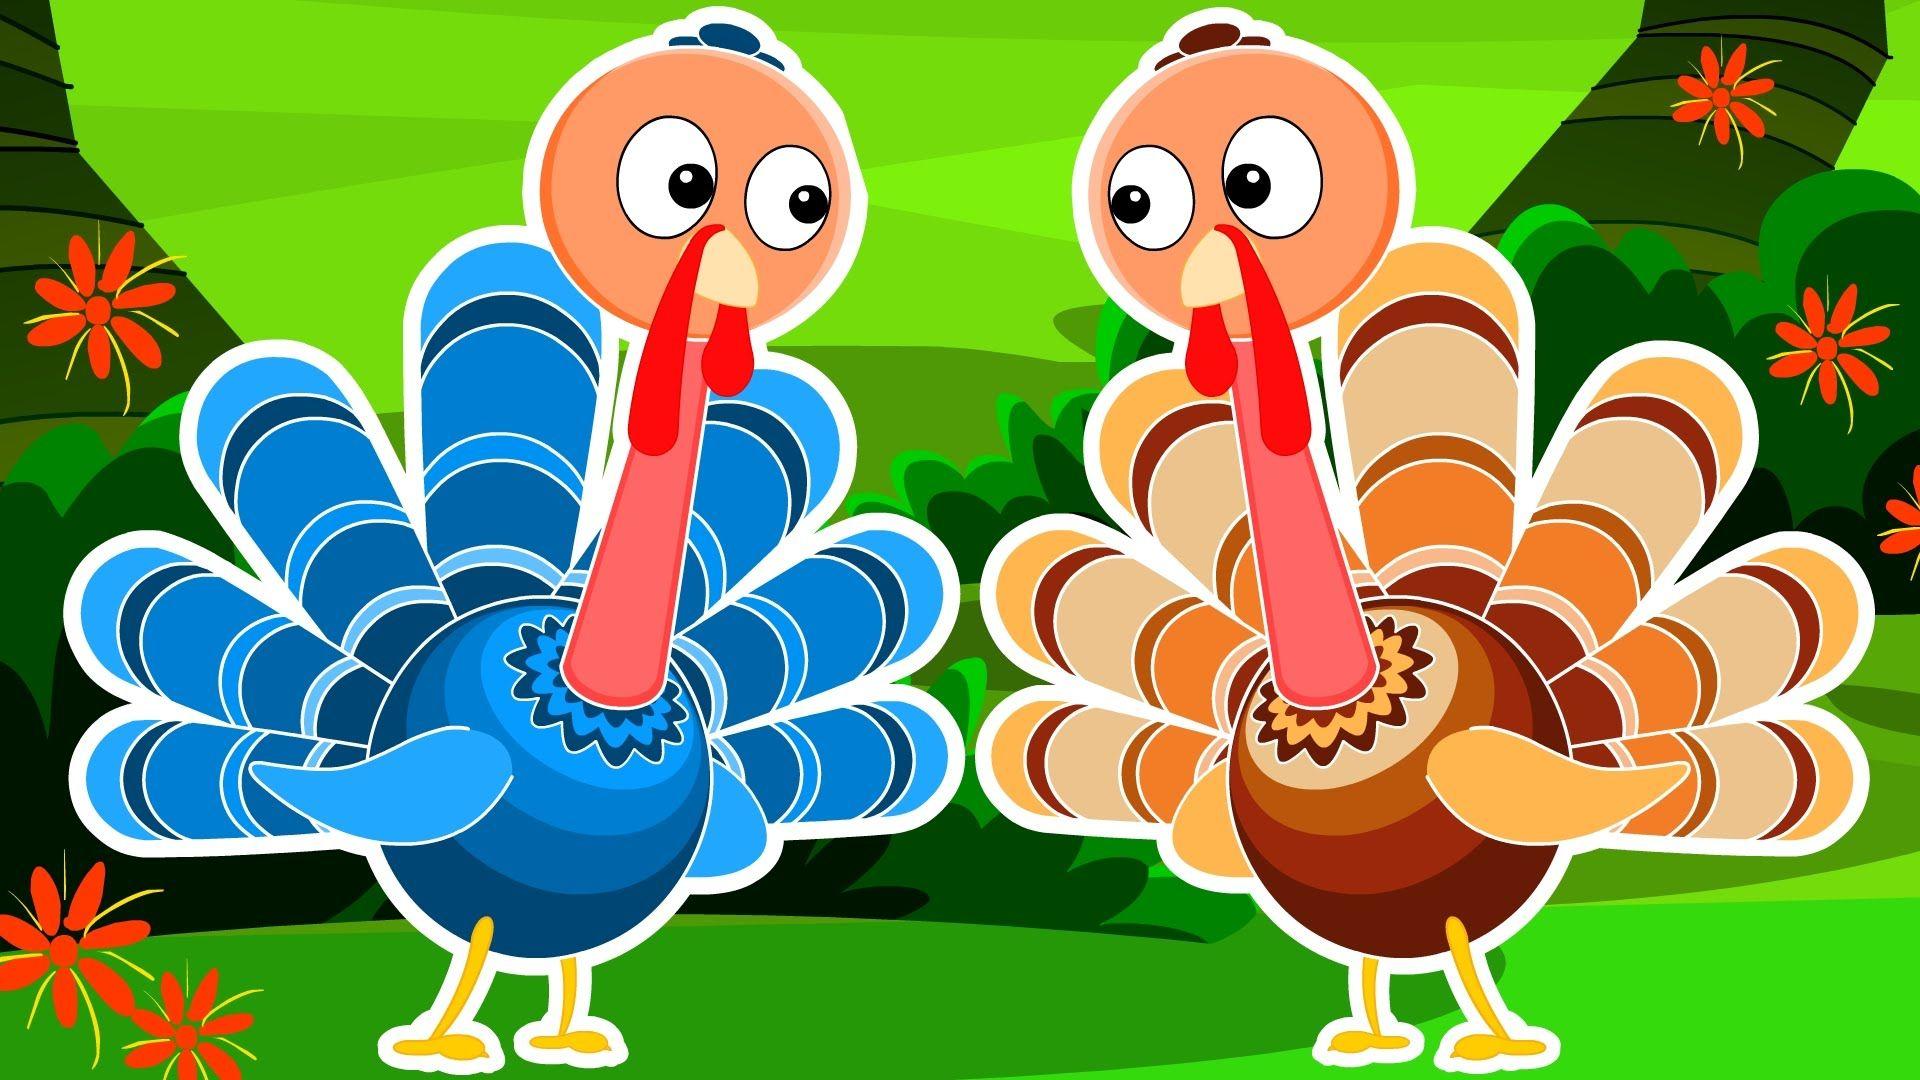 Five Little Turkeys | Turkey Song | Happy Thanks Giving | Happy ...